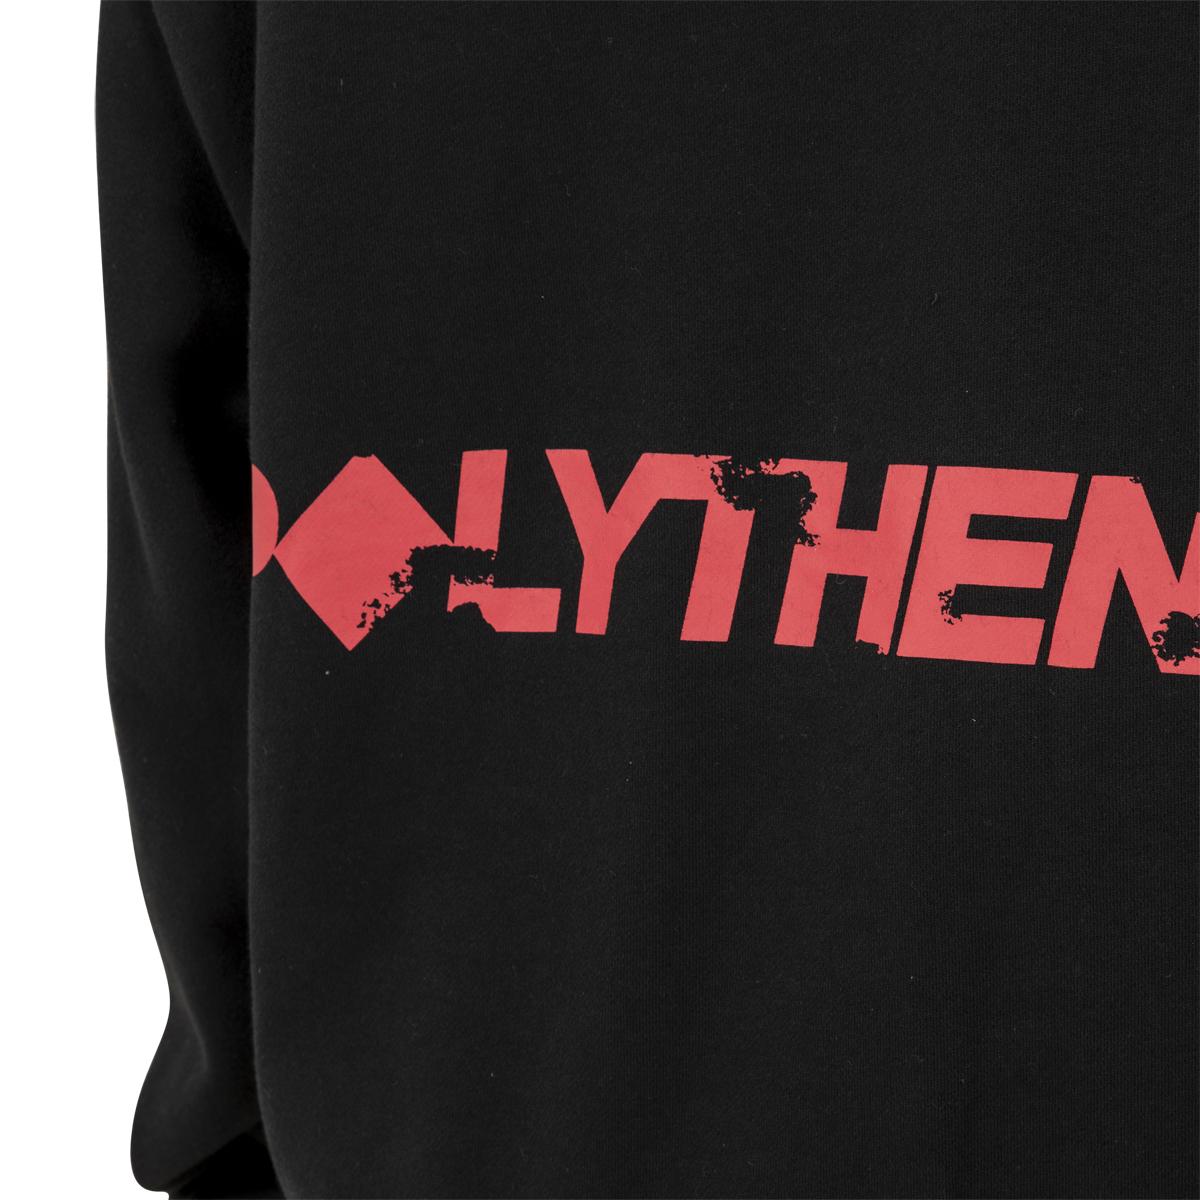 Polythene* Optics Halfway Sweater